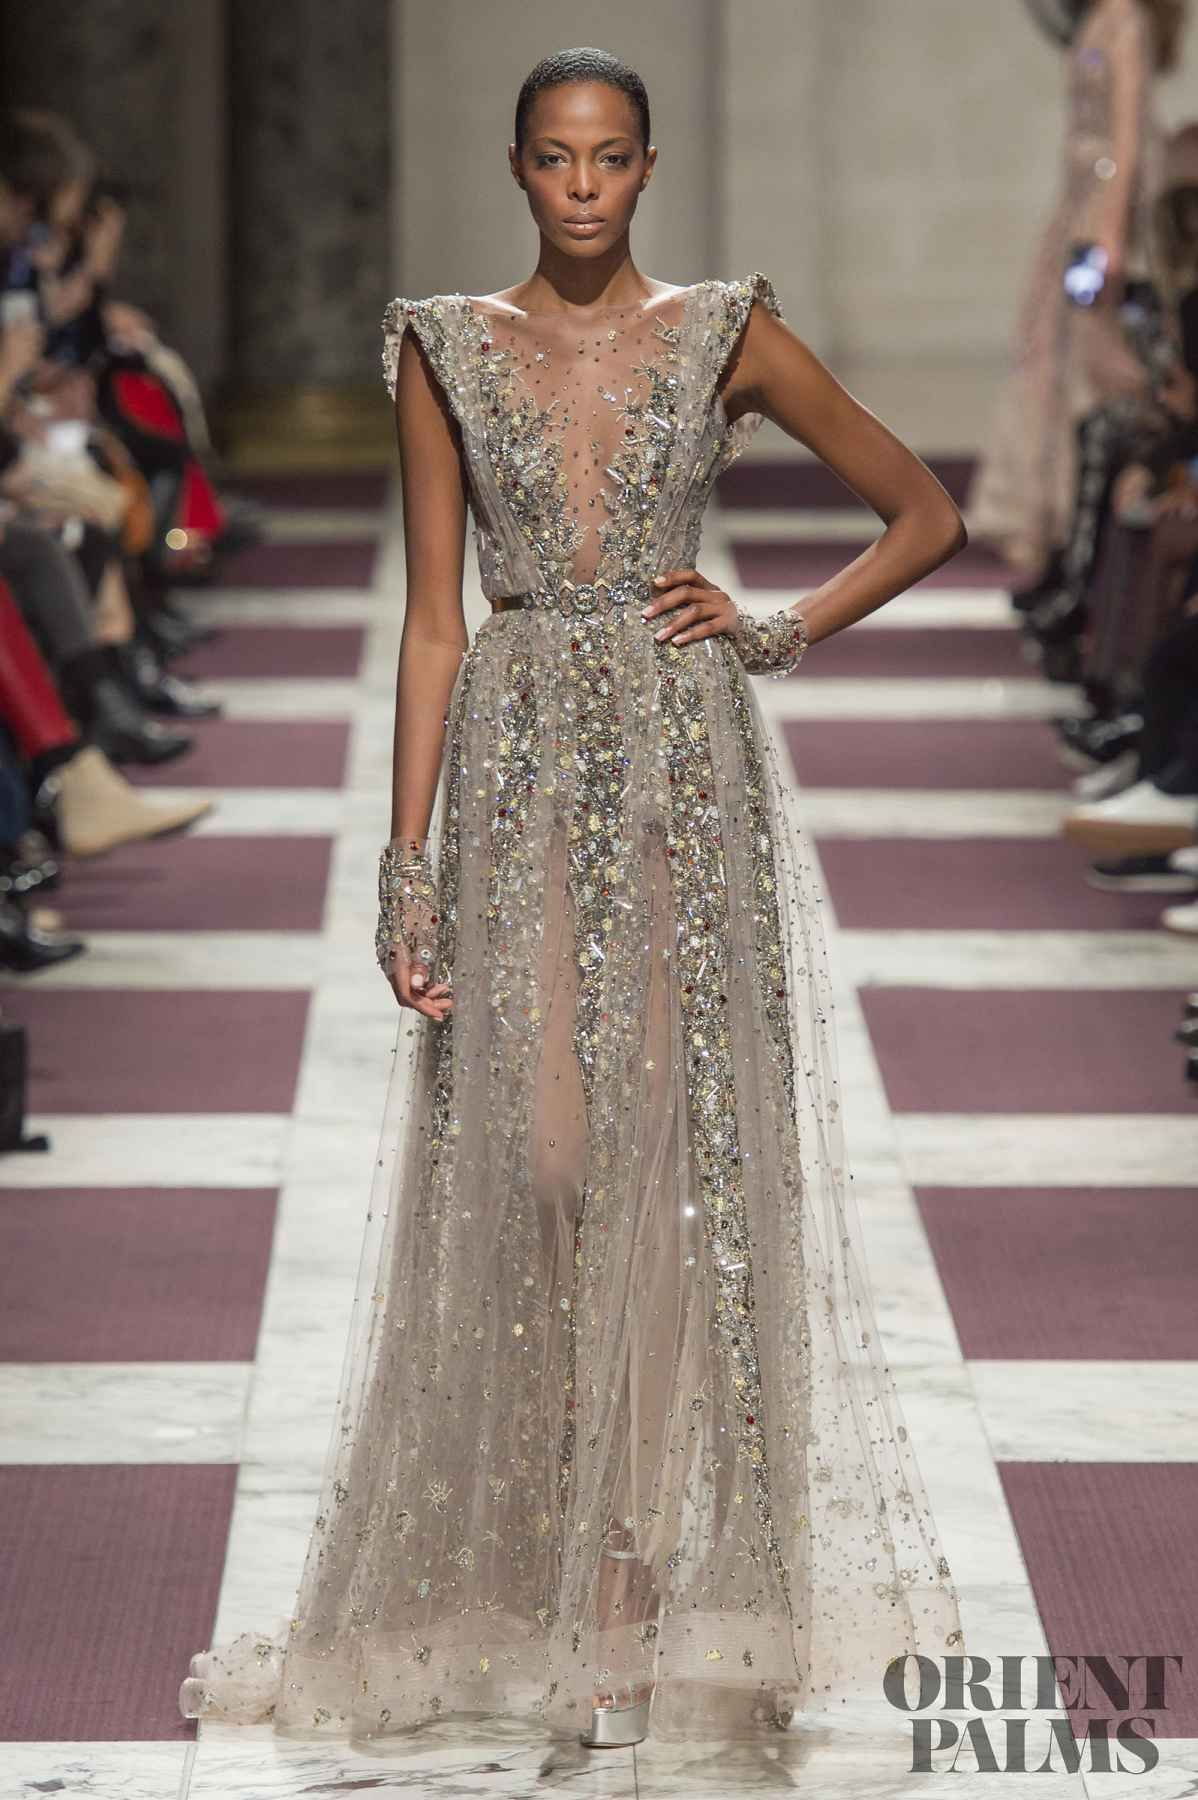 Ziad Nakad Frühjahr/Sommer 17 - Couture  Couture kleider